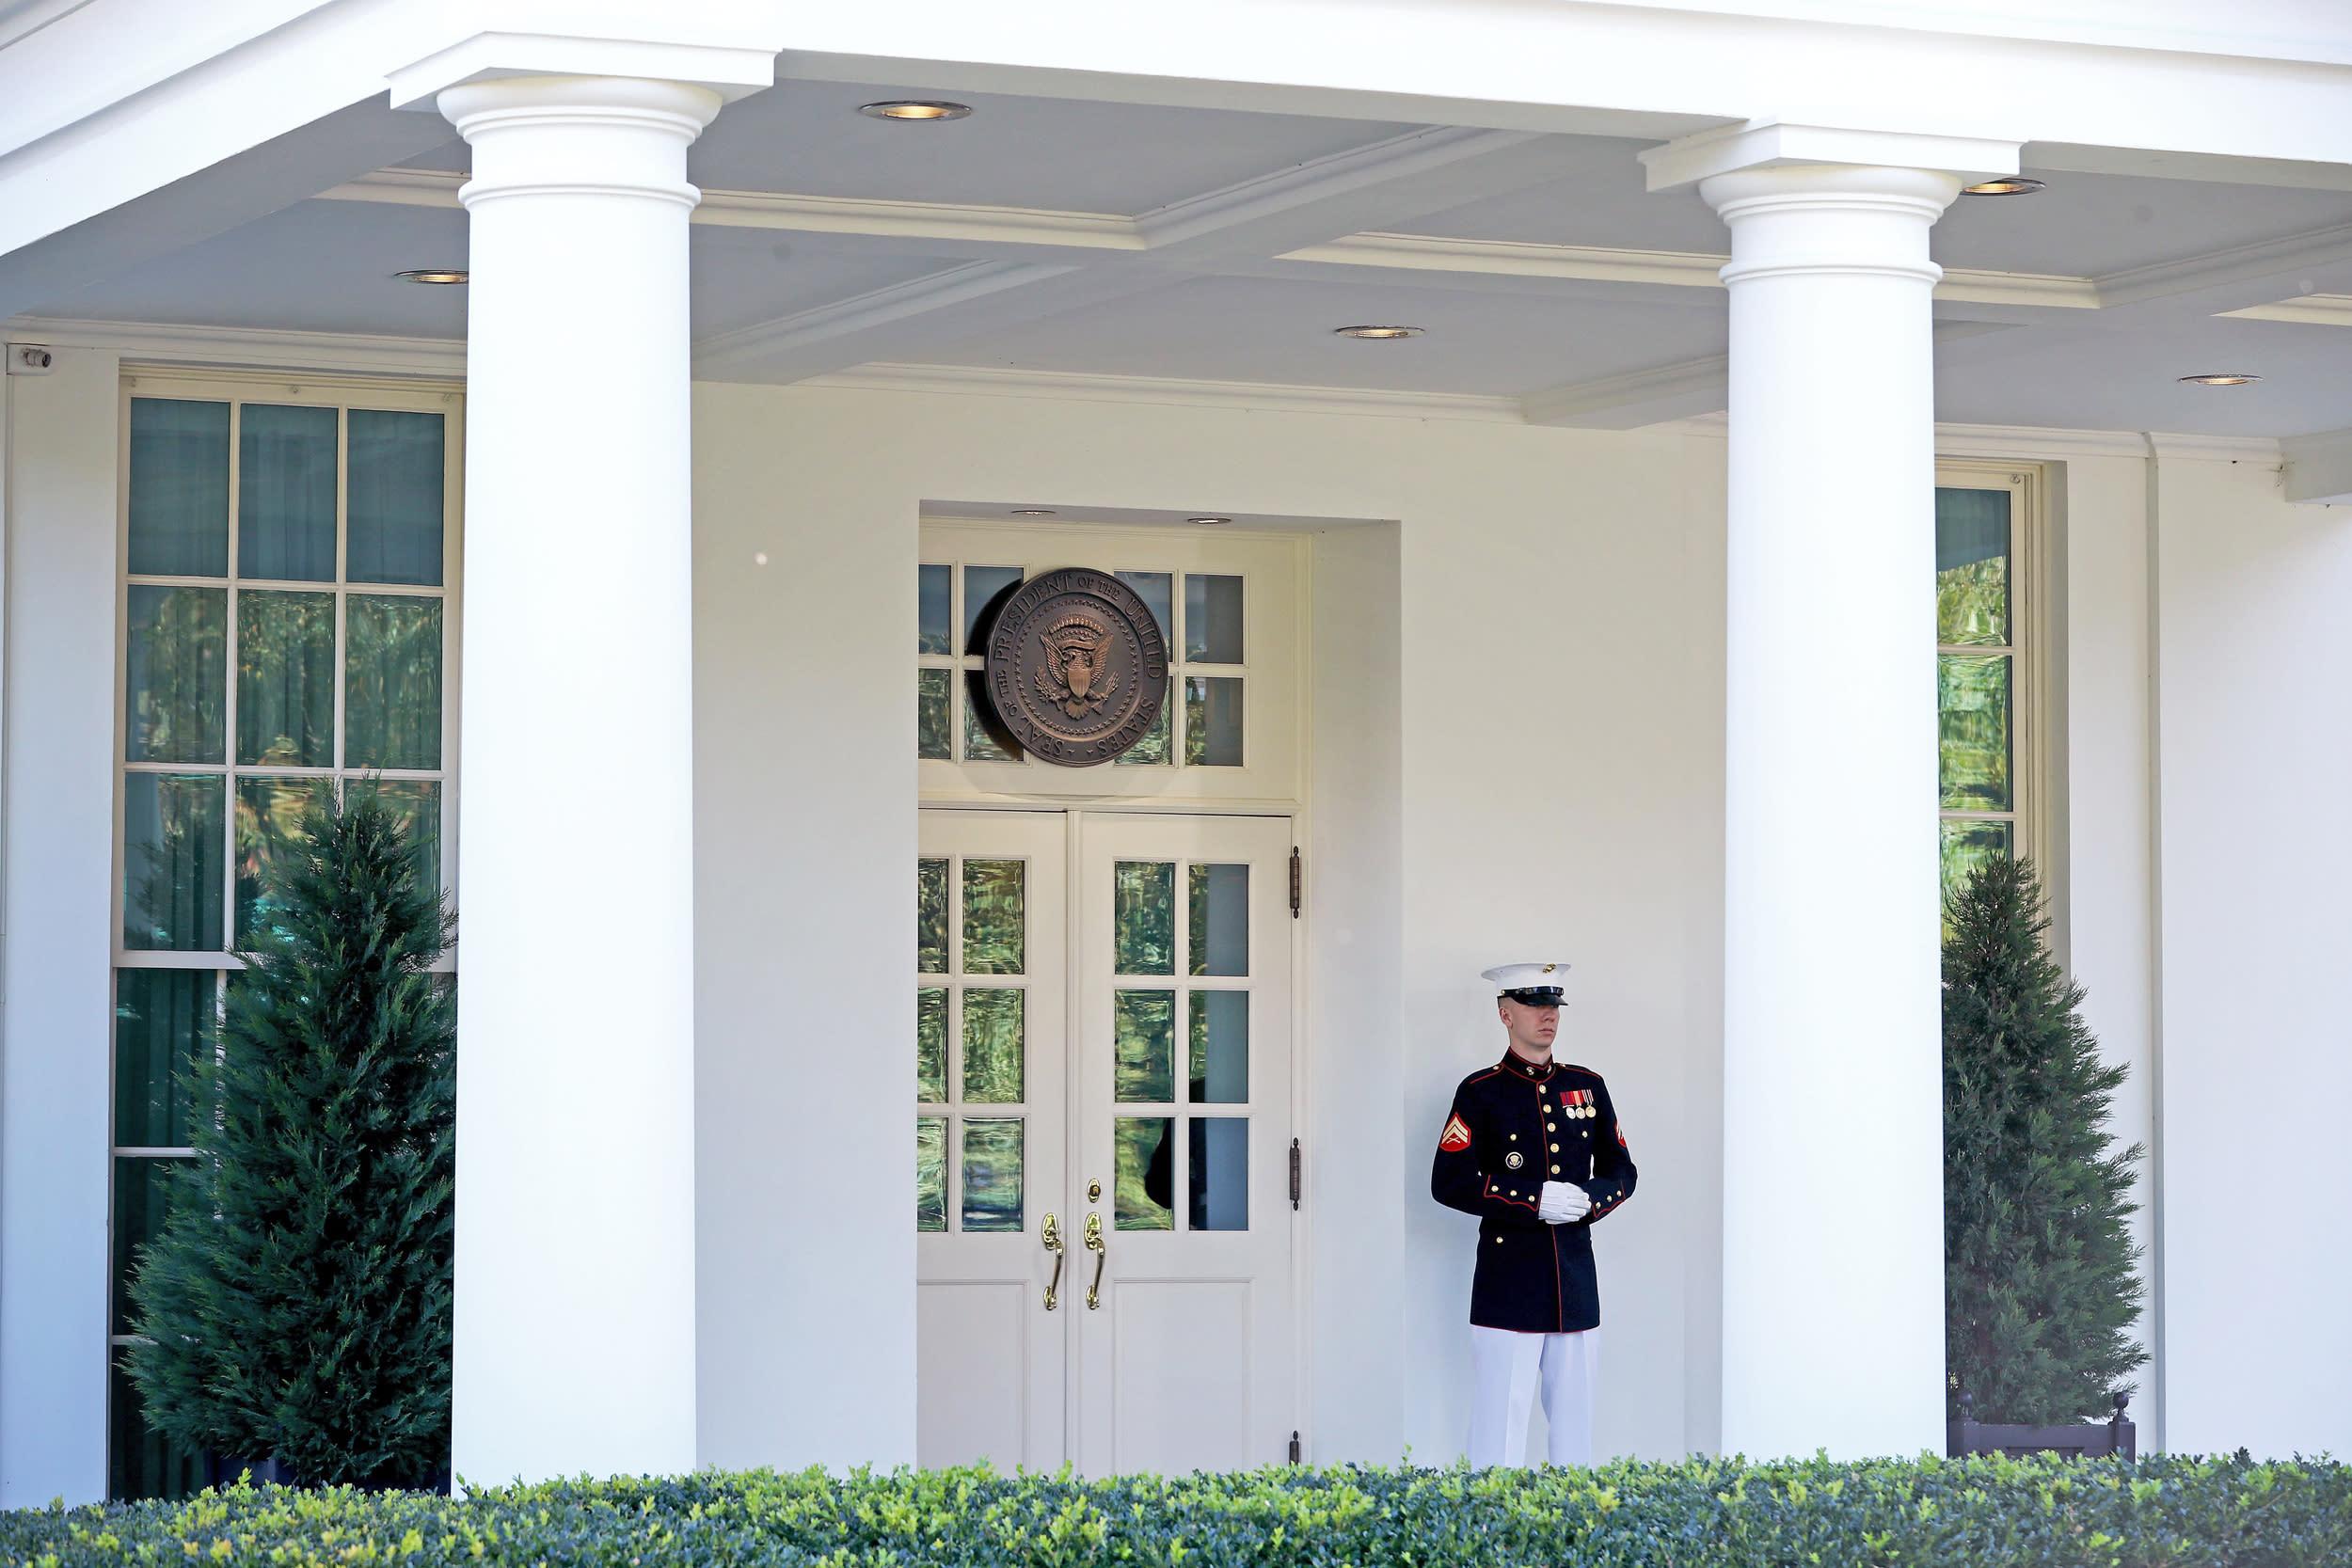 Trump returns to Oval Office, declares himself cured of coronavirus